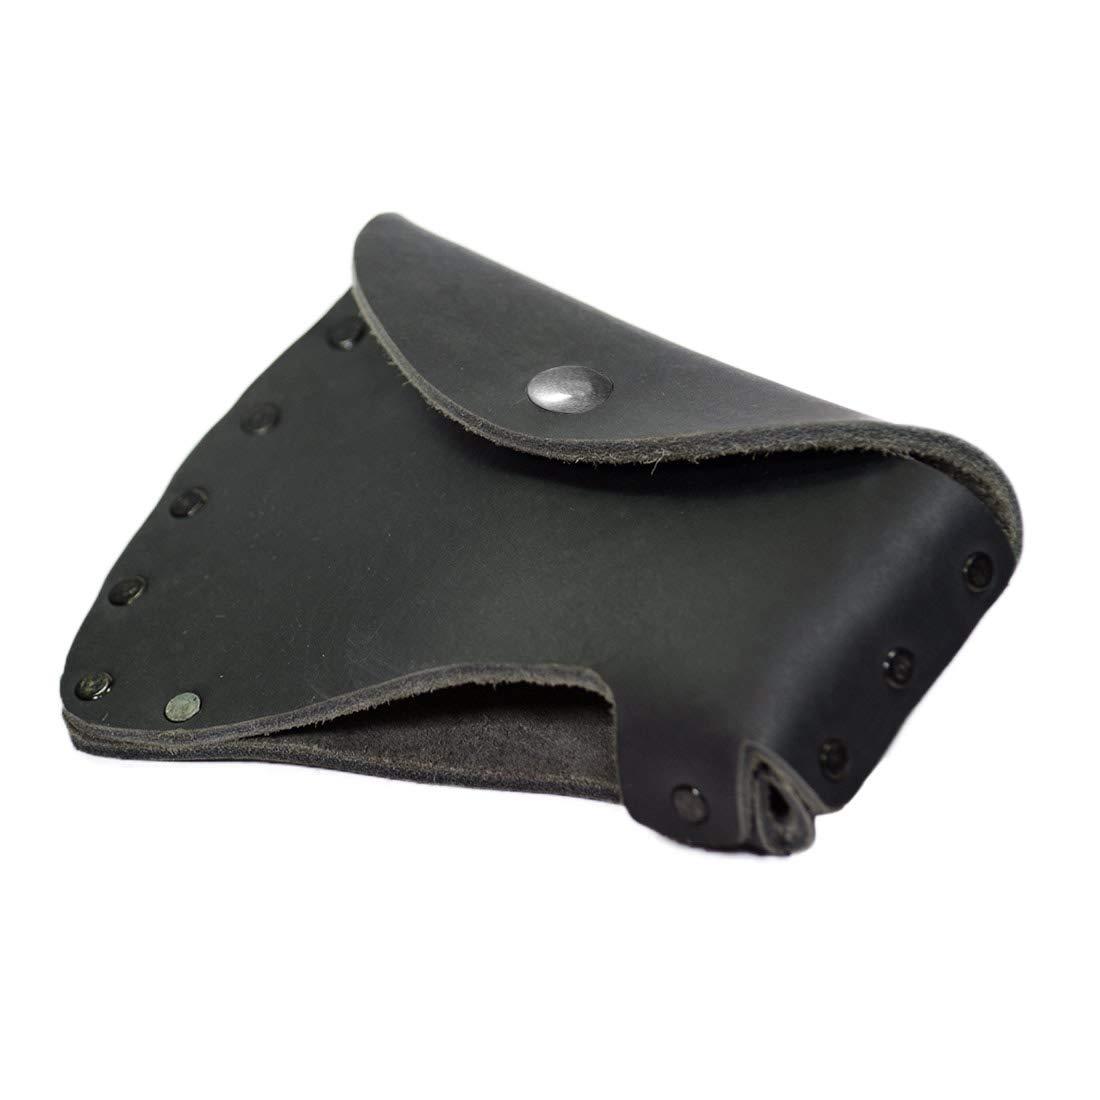 Hide & Drink, Durable Leather Hatchet Head Sheath/Axe Case/Blade Cover/Lumberjack Essentials, Handmade :: Charcoal Black by Hide & Drink